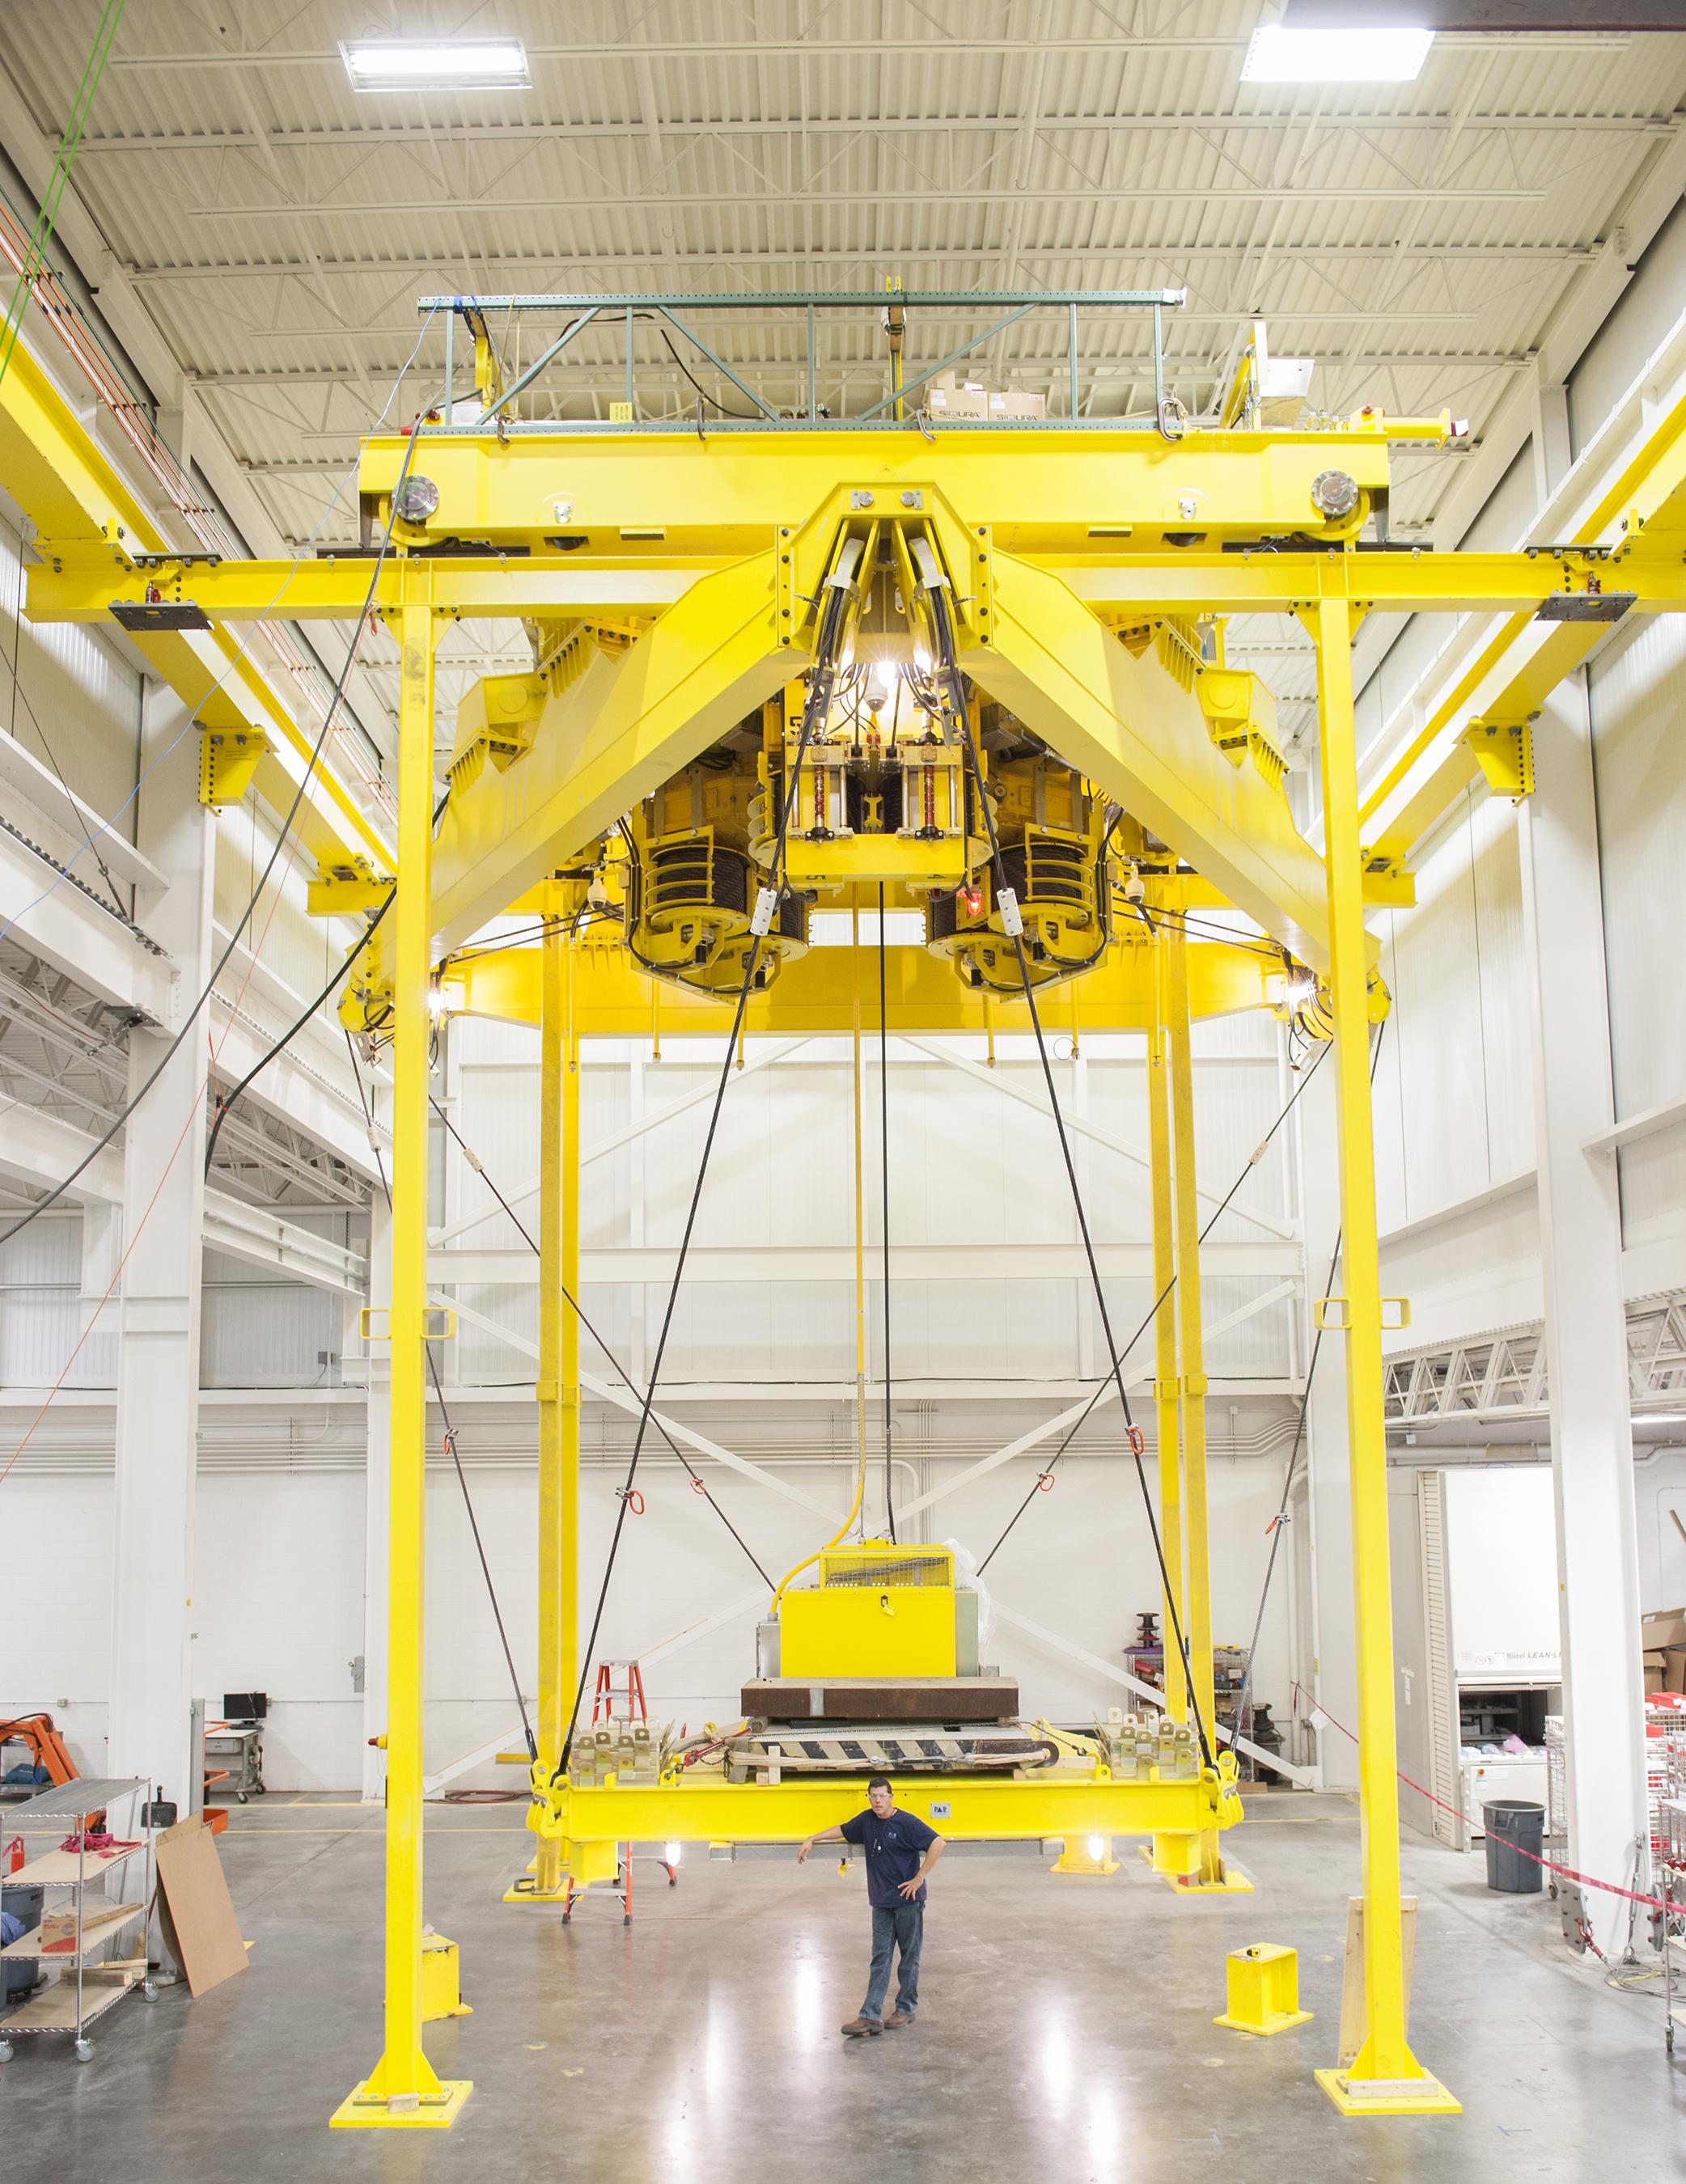 PaR Systems' TensileTruss™ before installation at Chernobyl. (Photo: PaR Systems, Inc.)